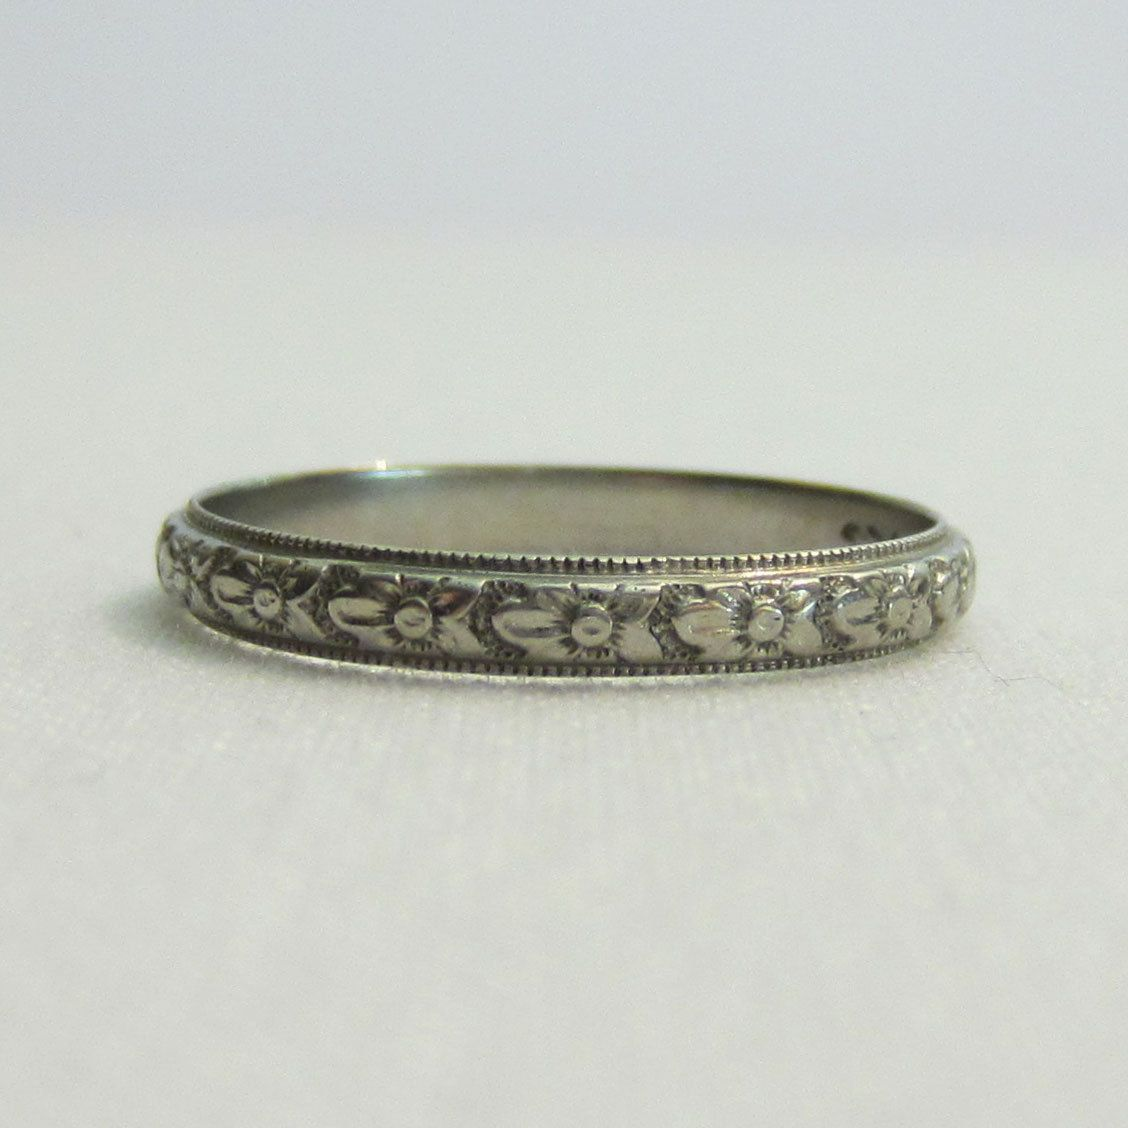 Vintage Wedding Rings 1920 | Vintage Wedding Ring, Orange Blossom Pattern. Rare Large Size, Circa ...